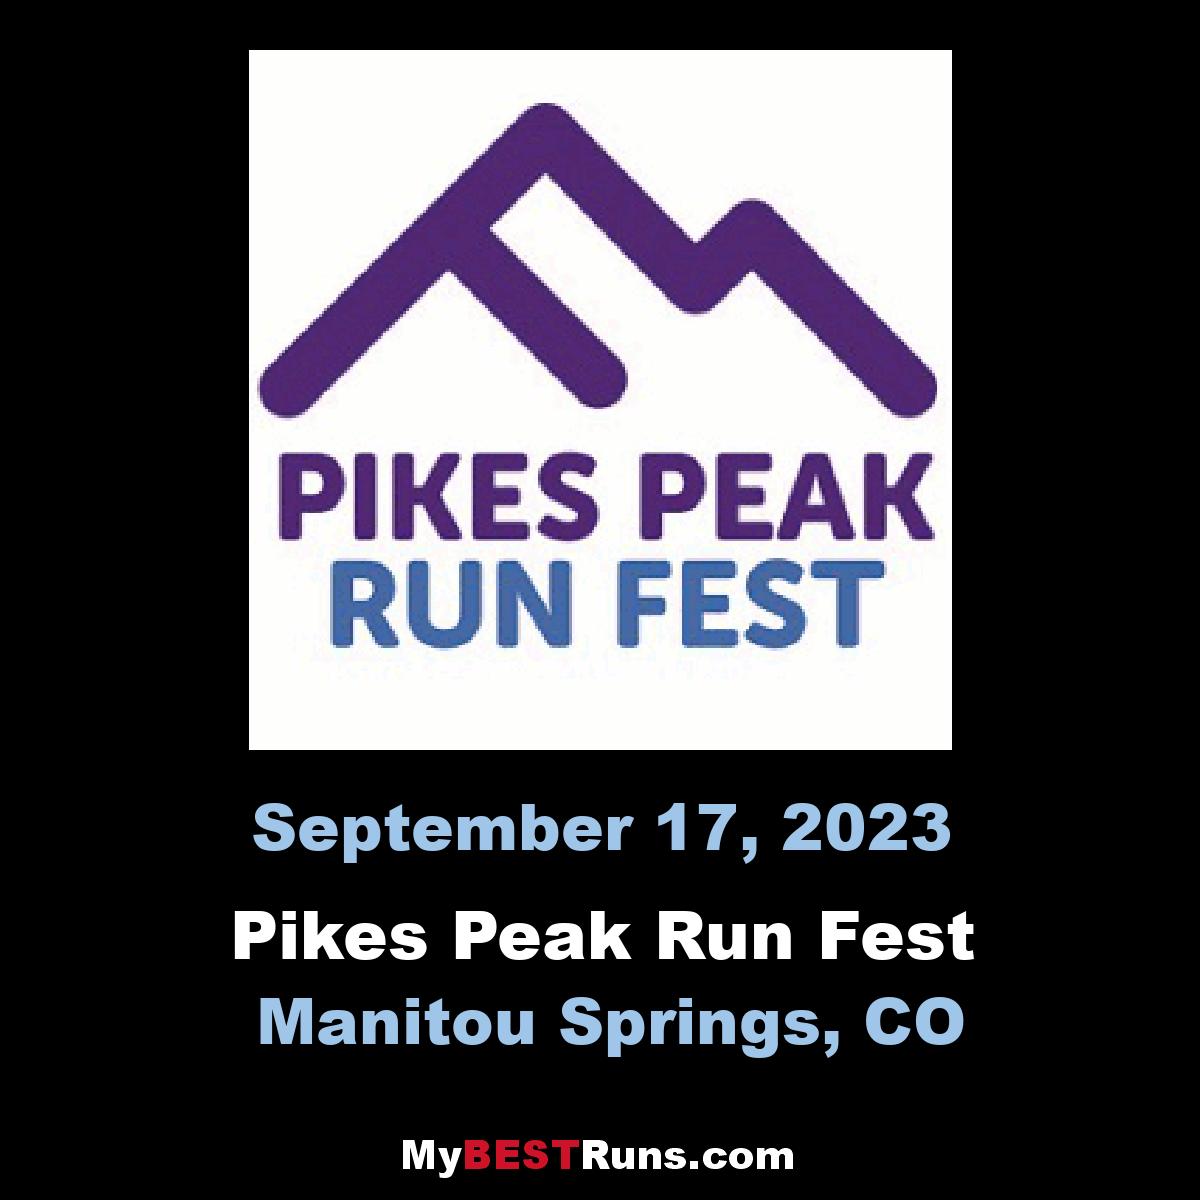 Pike to peak coupon code